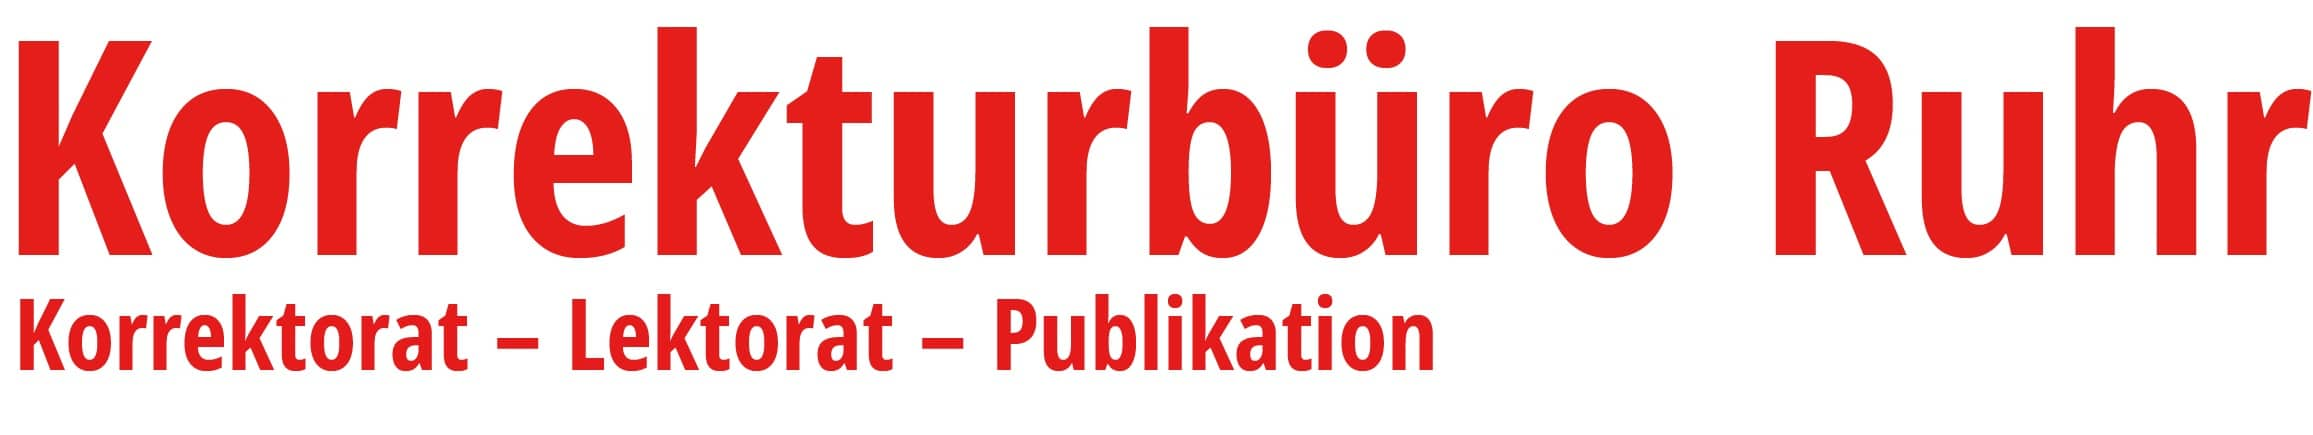 Korrekturbüro Ruhr – Lektorat